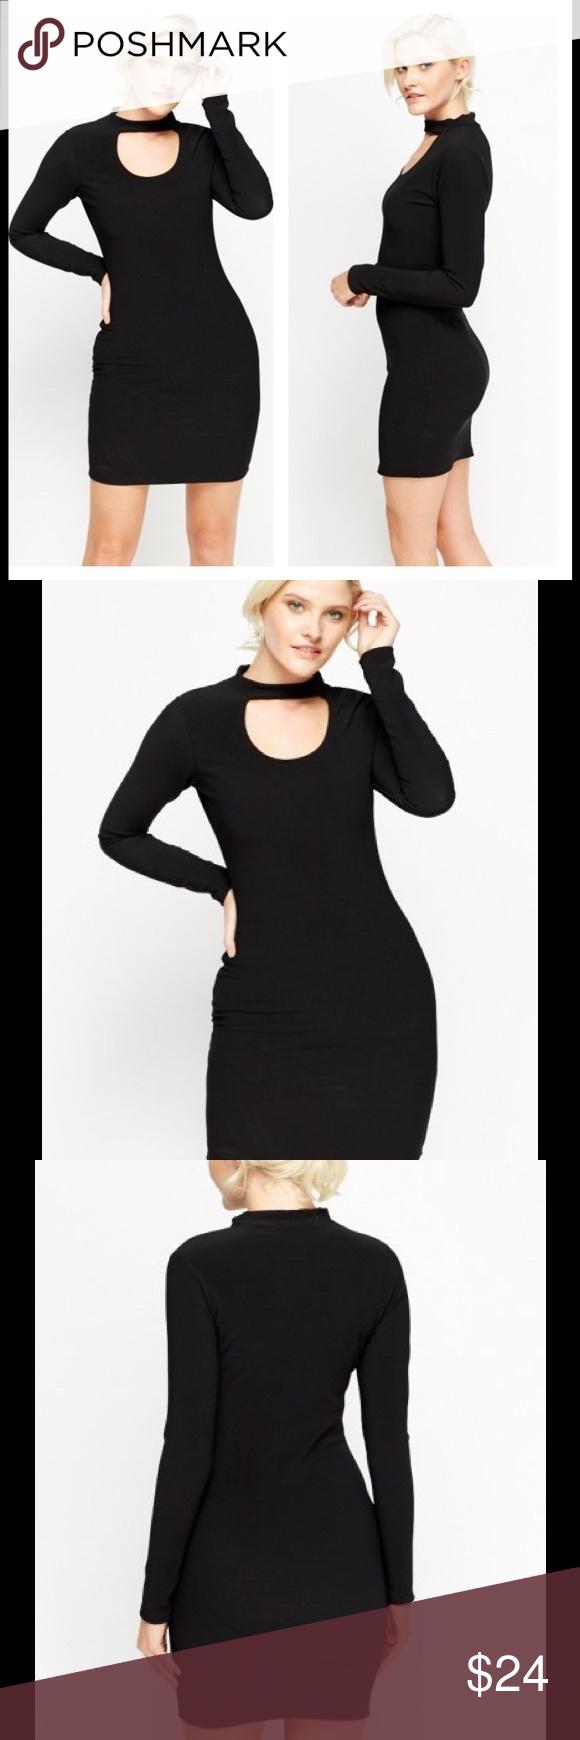 Nwt black bodycon dress sz cut out black bodycon dress